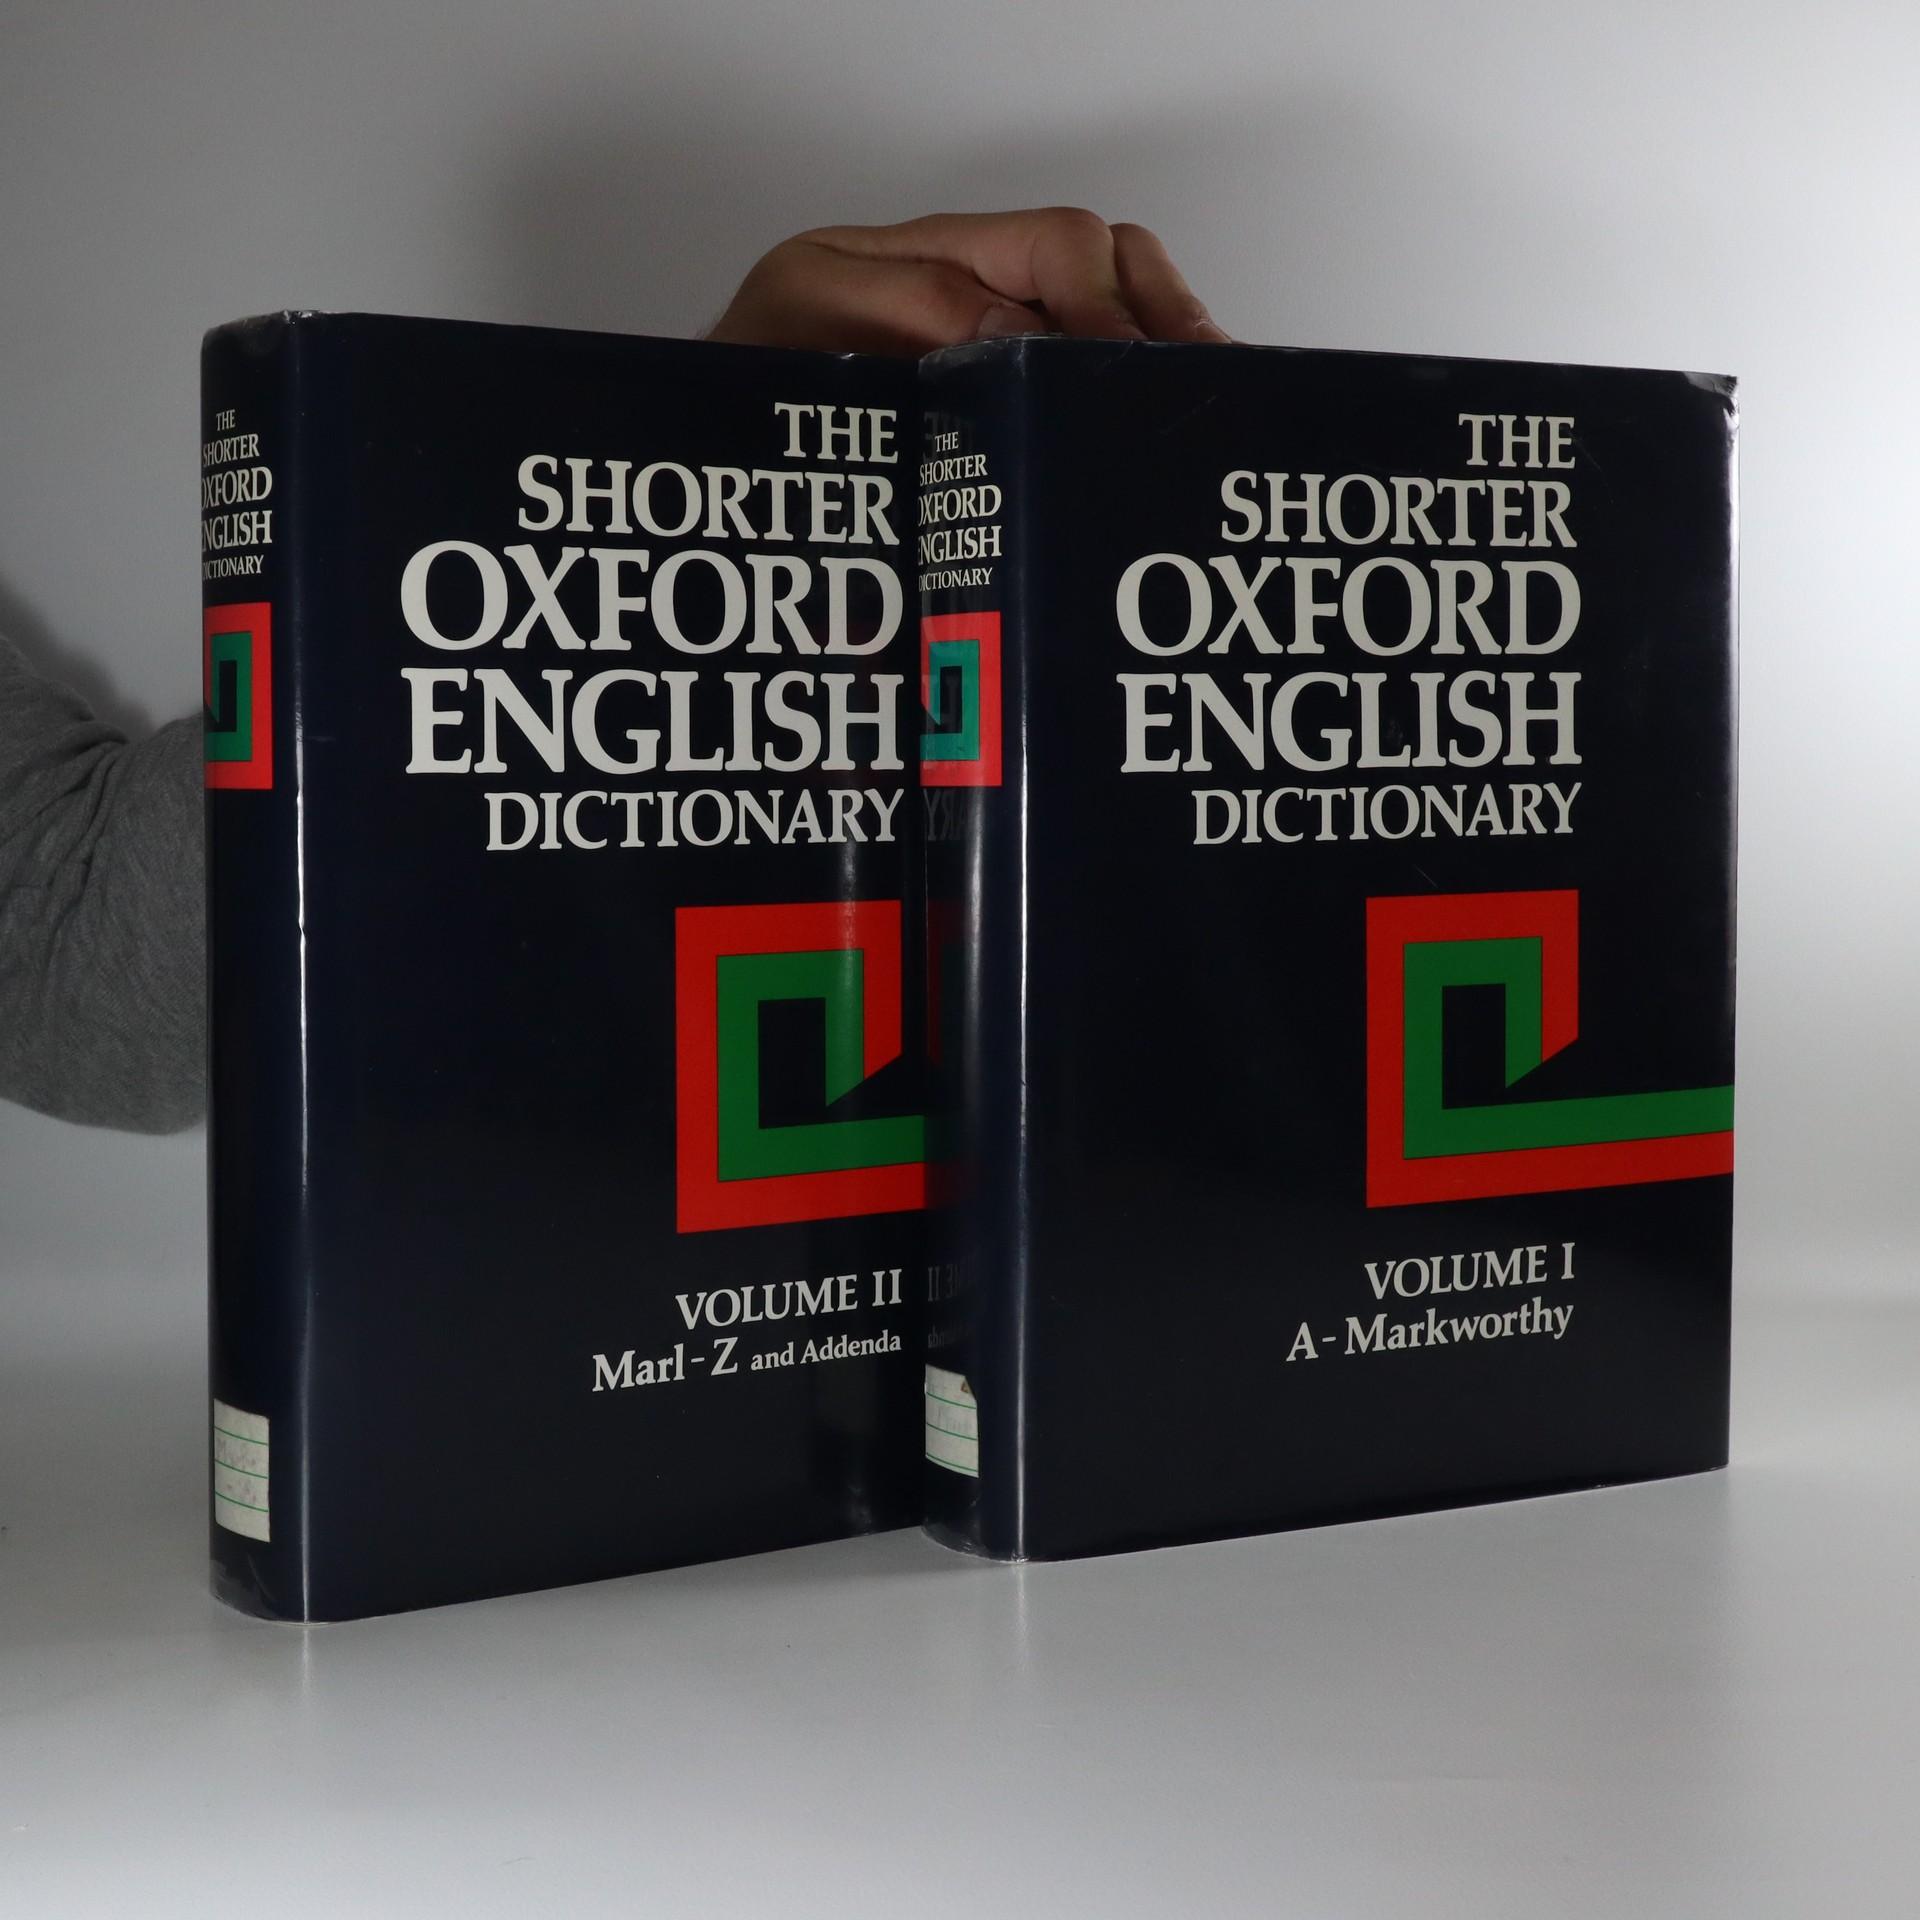 antikvární kniha The Shorter Oxford English Dictionary On historical principles. Volume I & I: A-Markworthy, Marl-Z, 1992